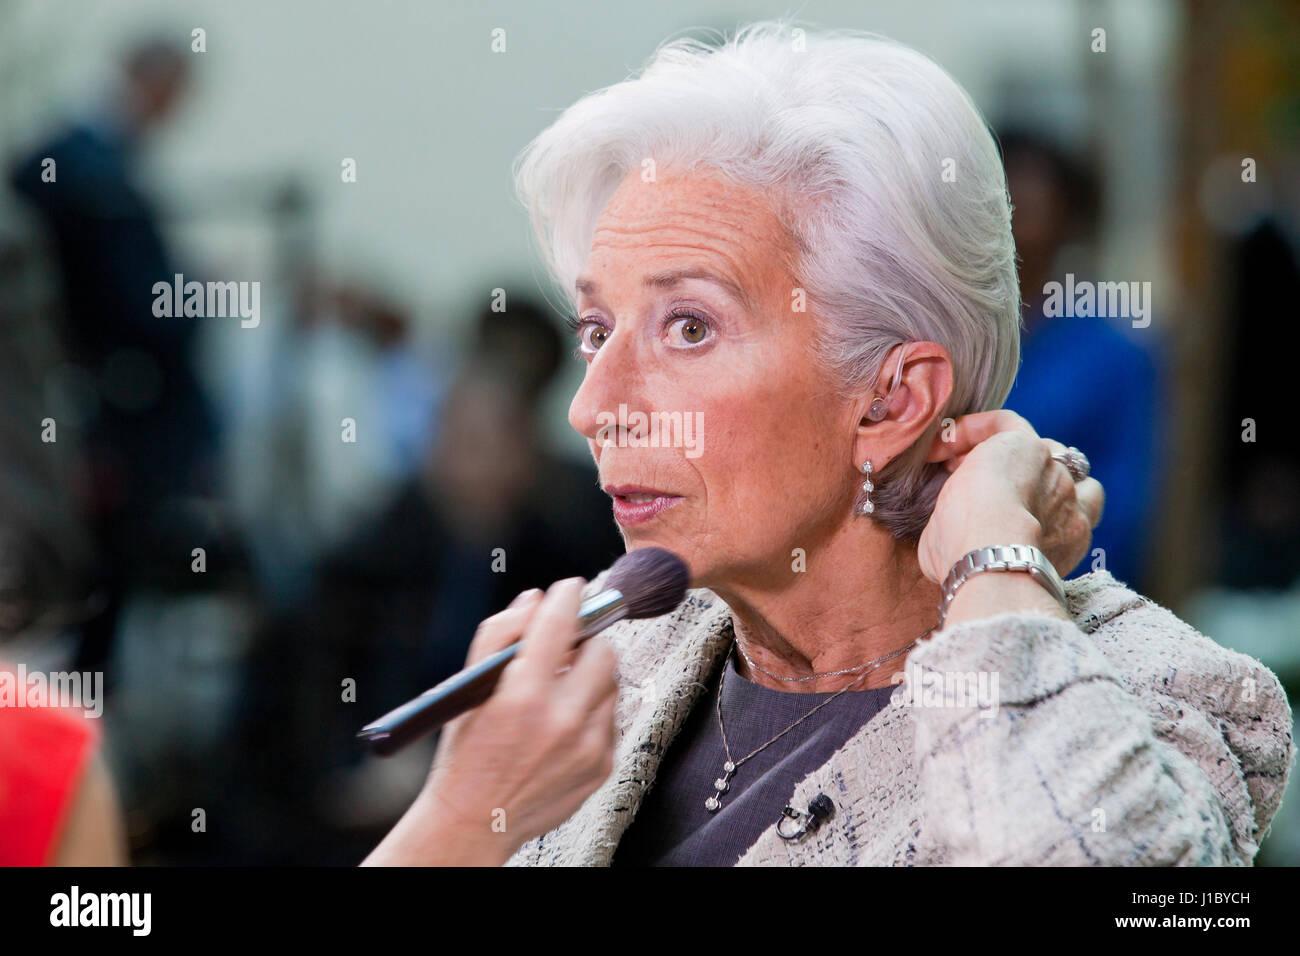 Christine Lagarde, Director if the International Monetary Fund (IMF), preparing for TV interview - USA - Stock Image